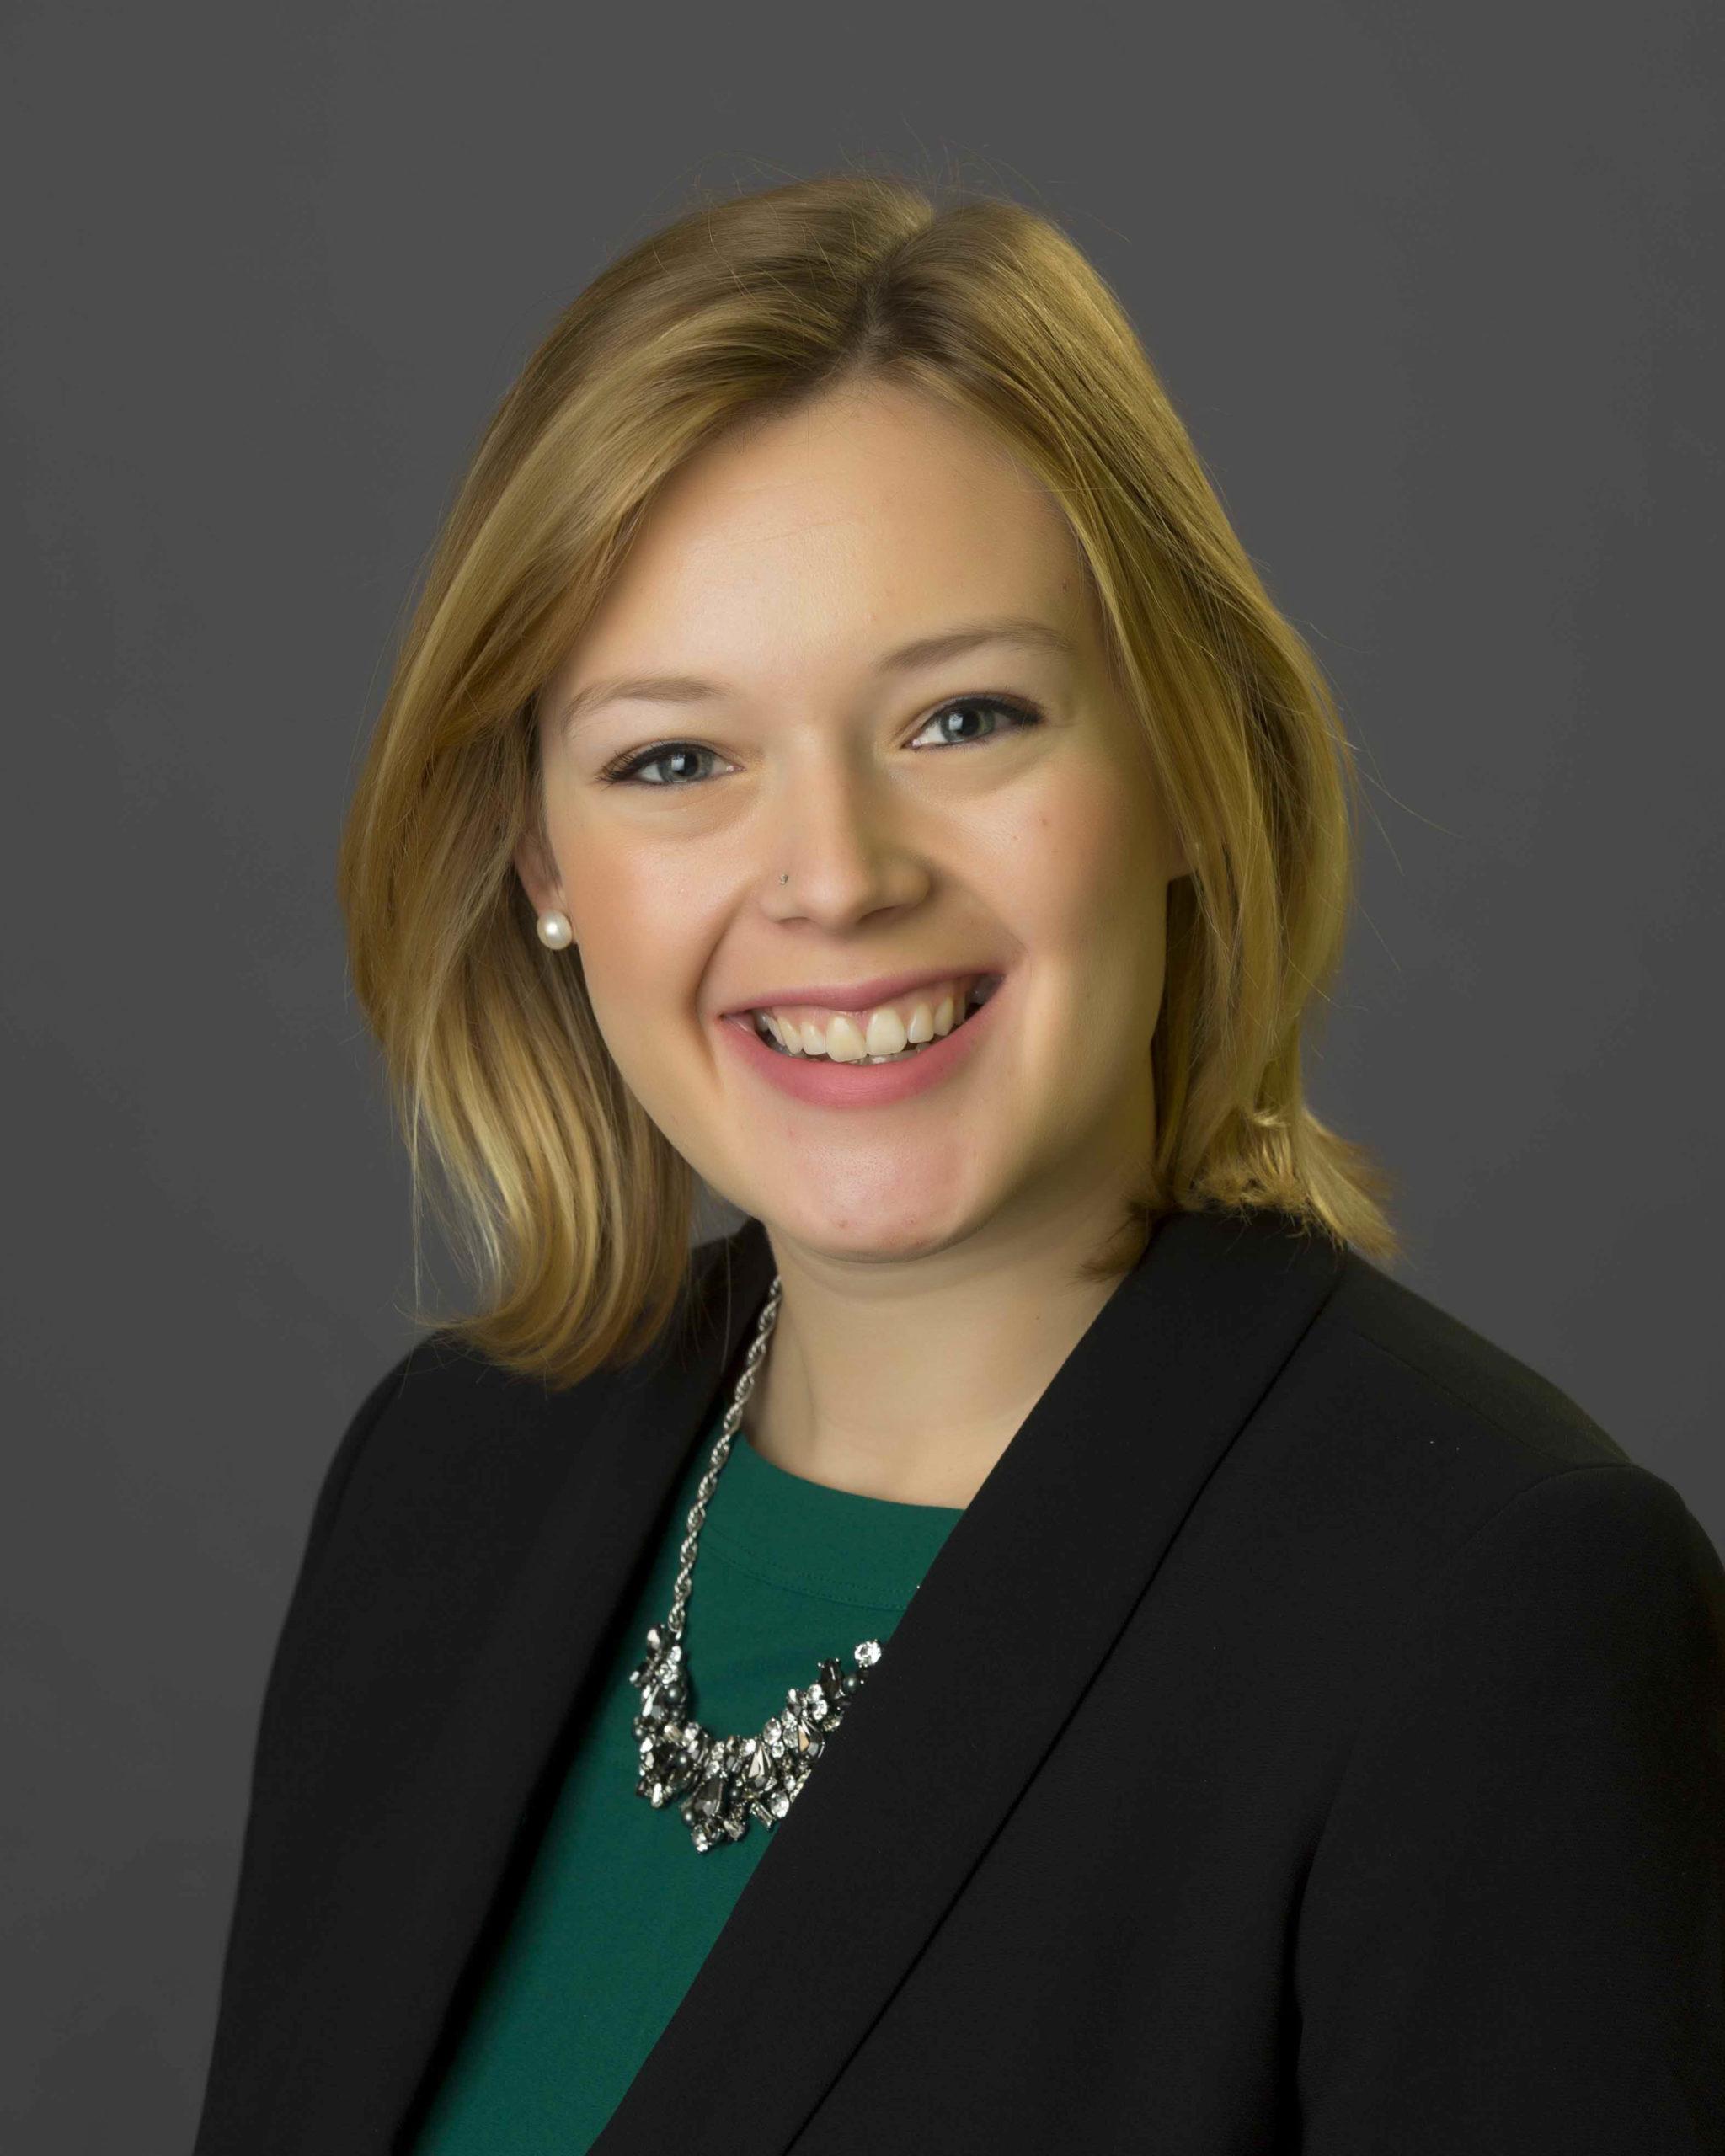 Helen Kyle